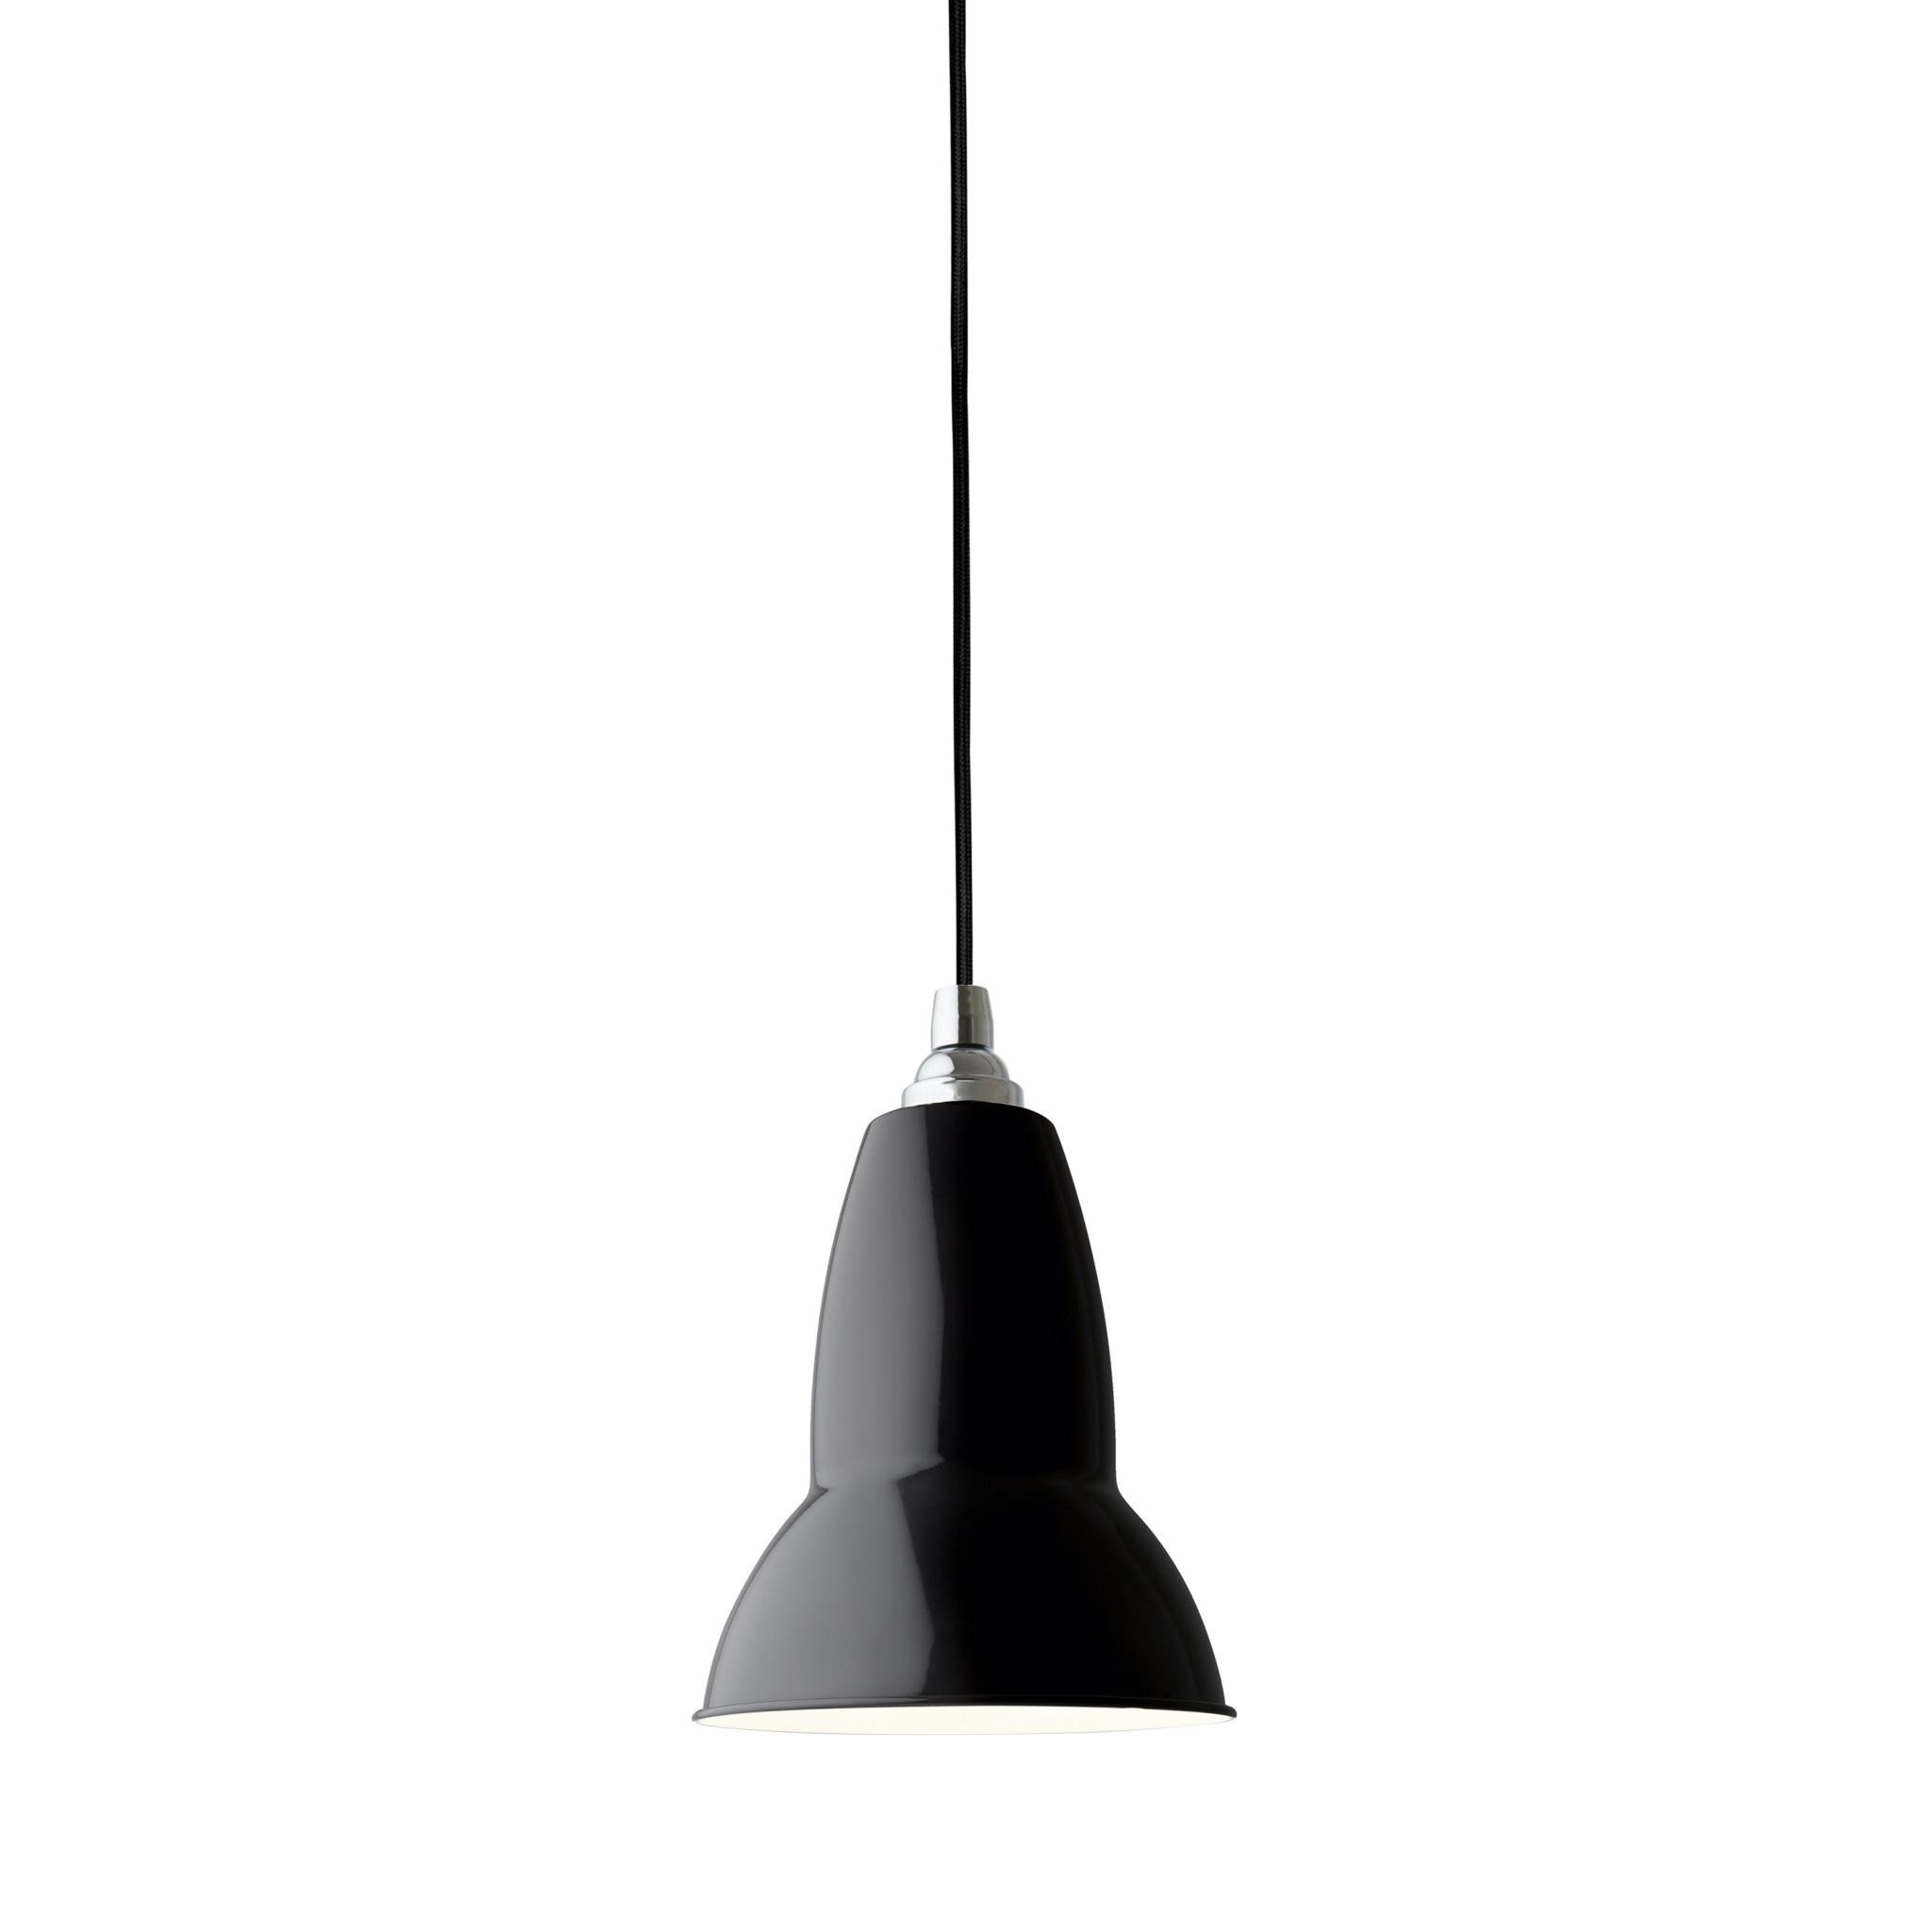 Anglepoise PREORDER Original 1227  Pendant Lamp - Jet Black with Chrome